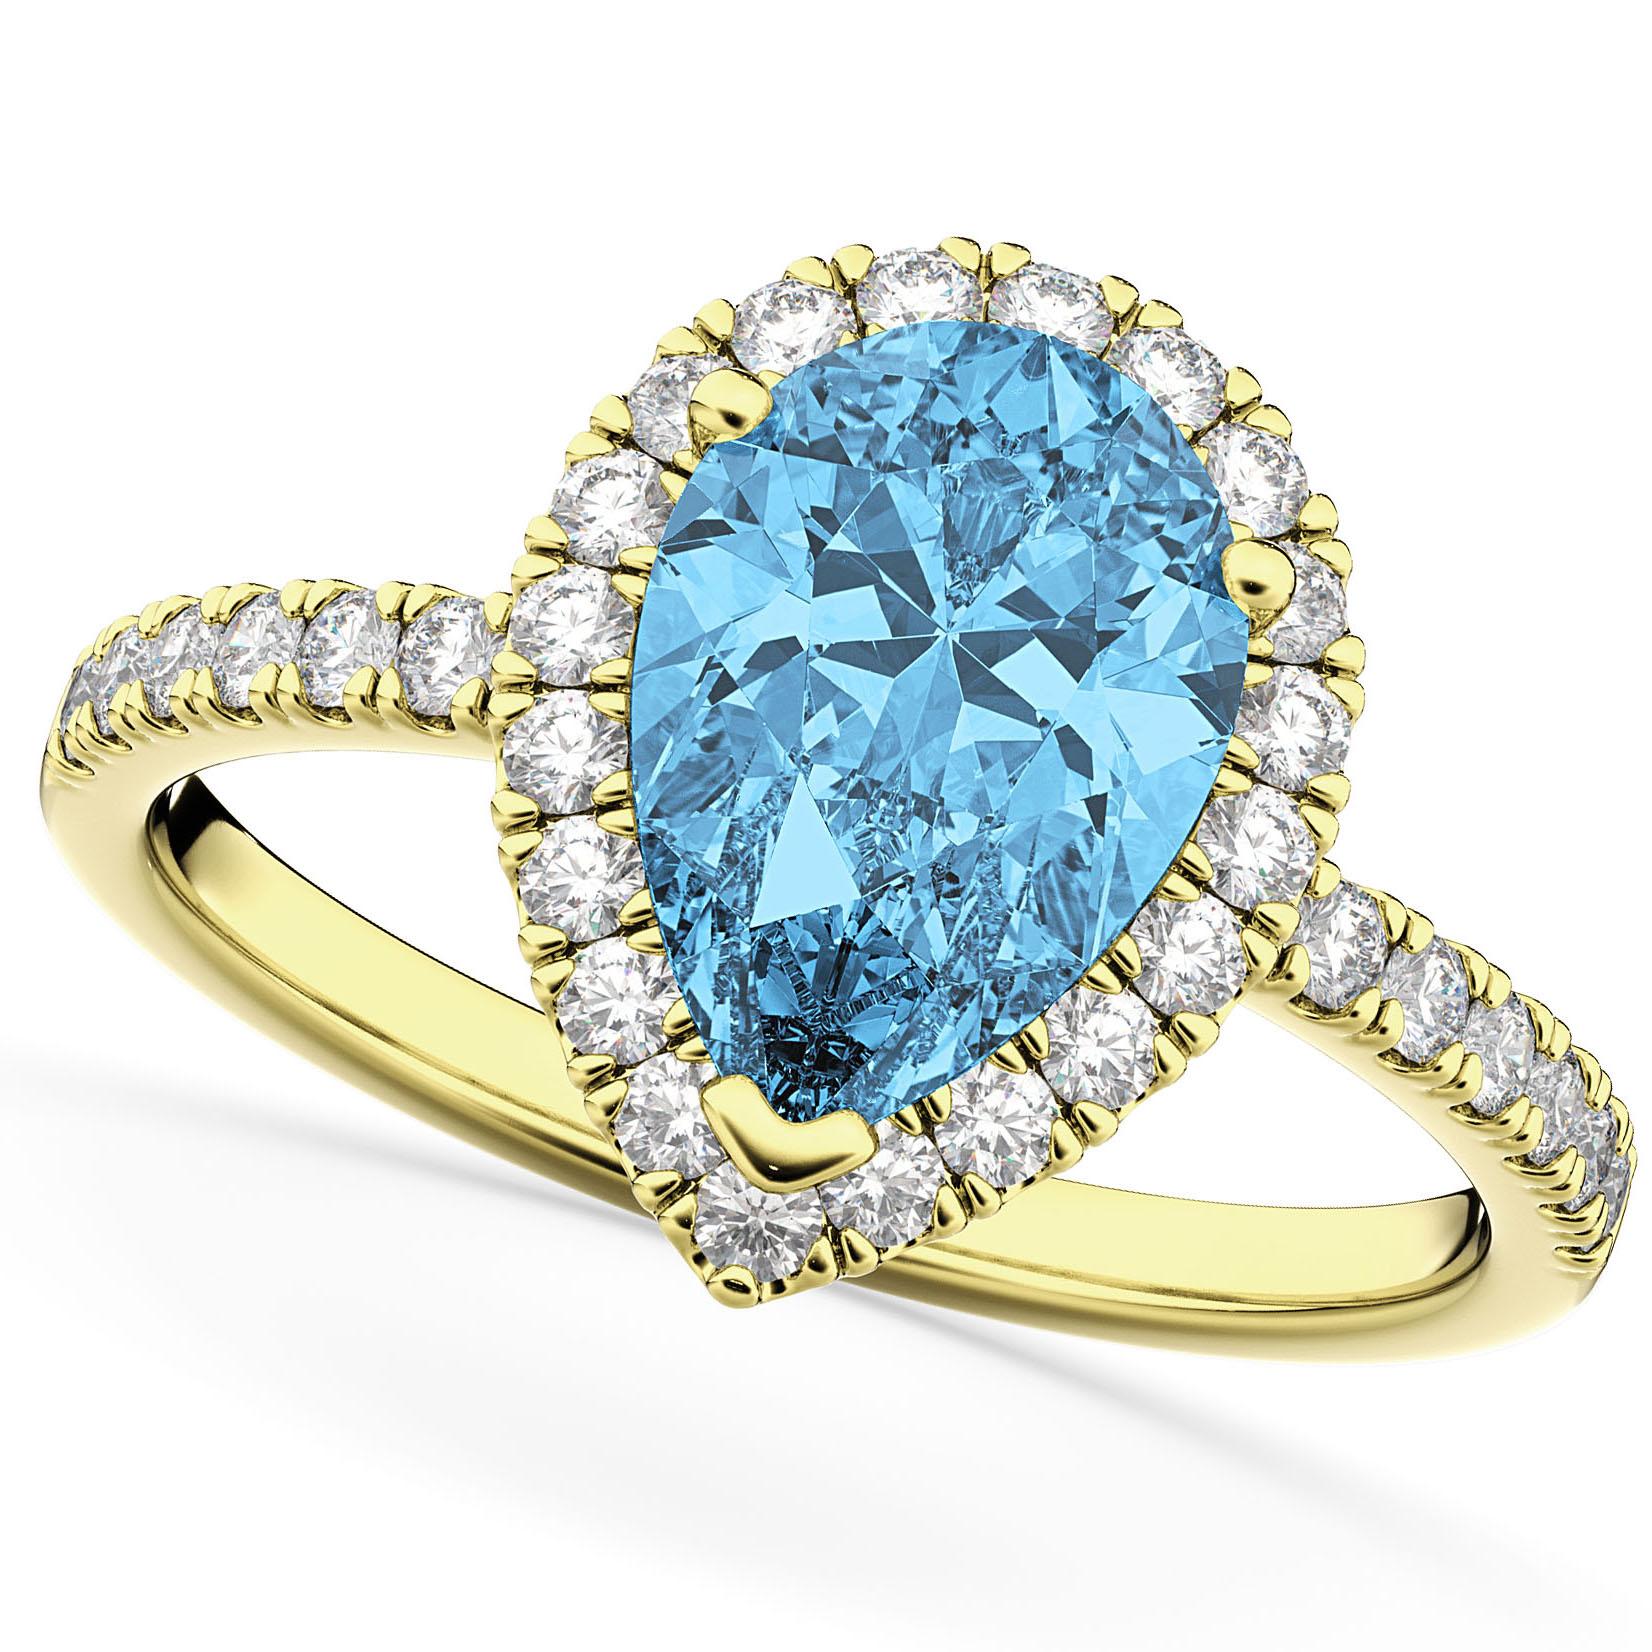 Pear Cut Halo Blue Topaz & Diamond Engagement Ring 14K Yellow Gold 1.91ct